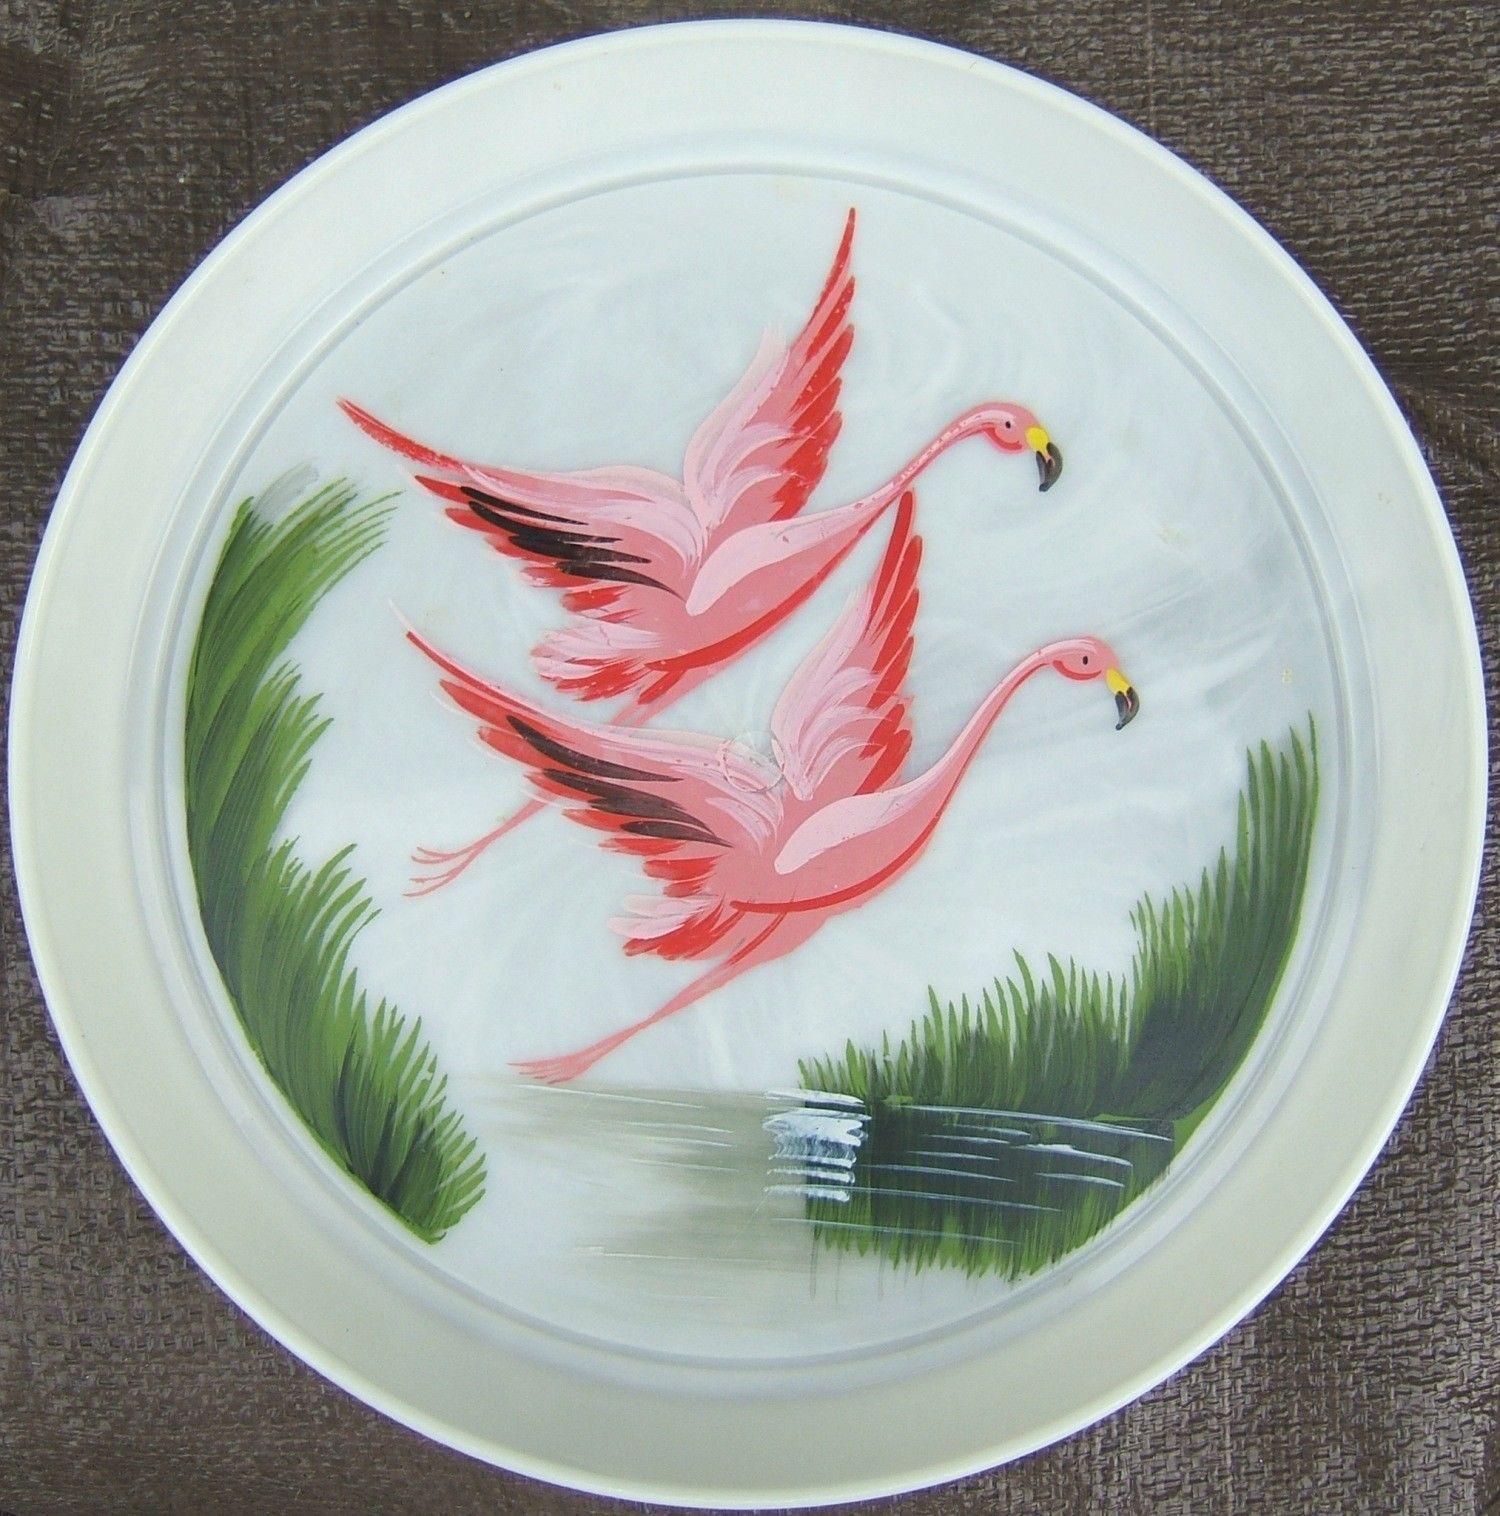 Decorative Plastic Serving Trays Vintage Pink Flamingo Scene Painted Plastic Serving Tray Platter